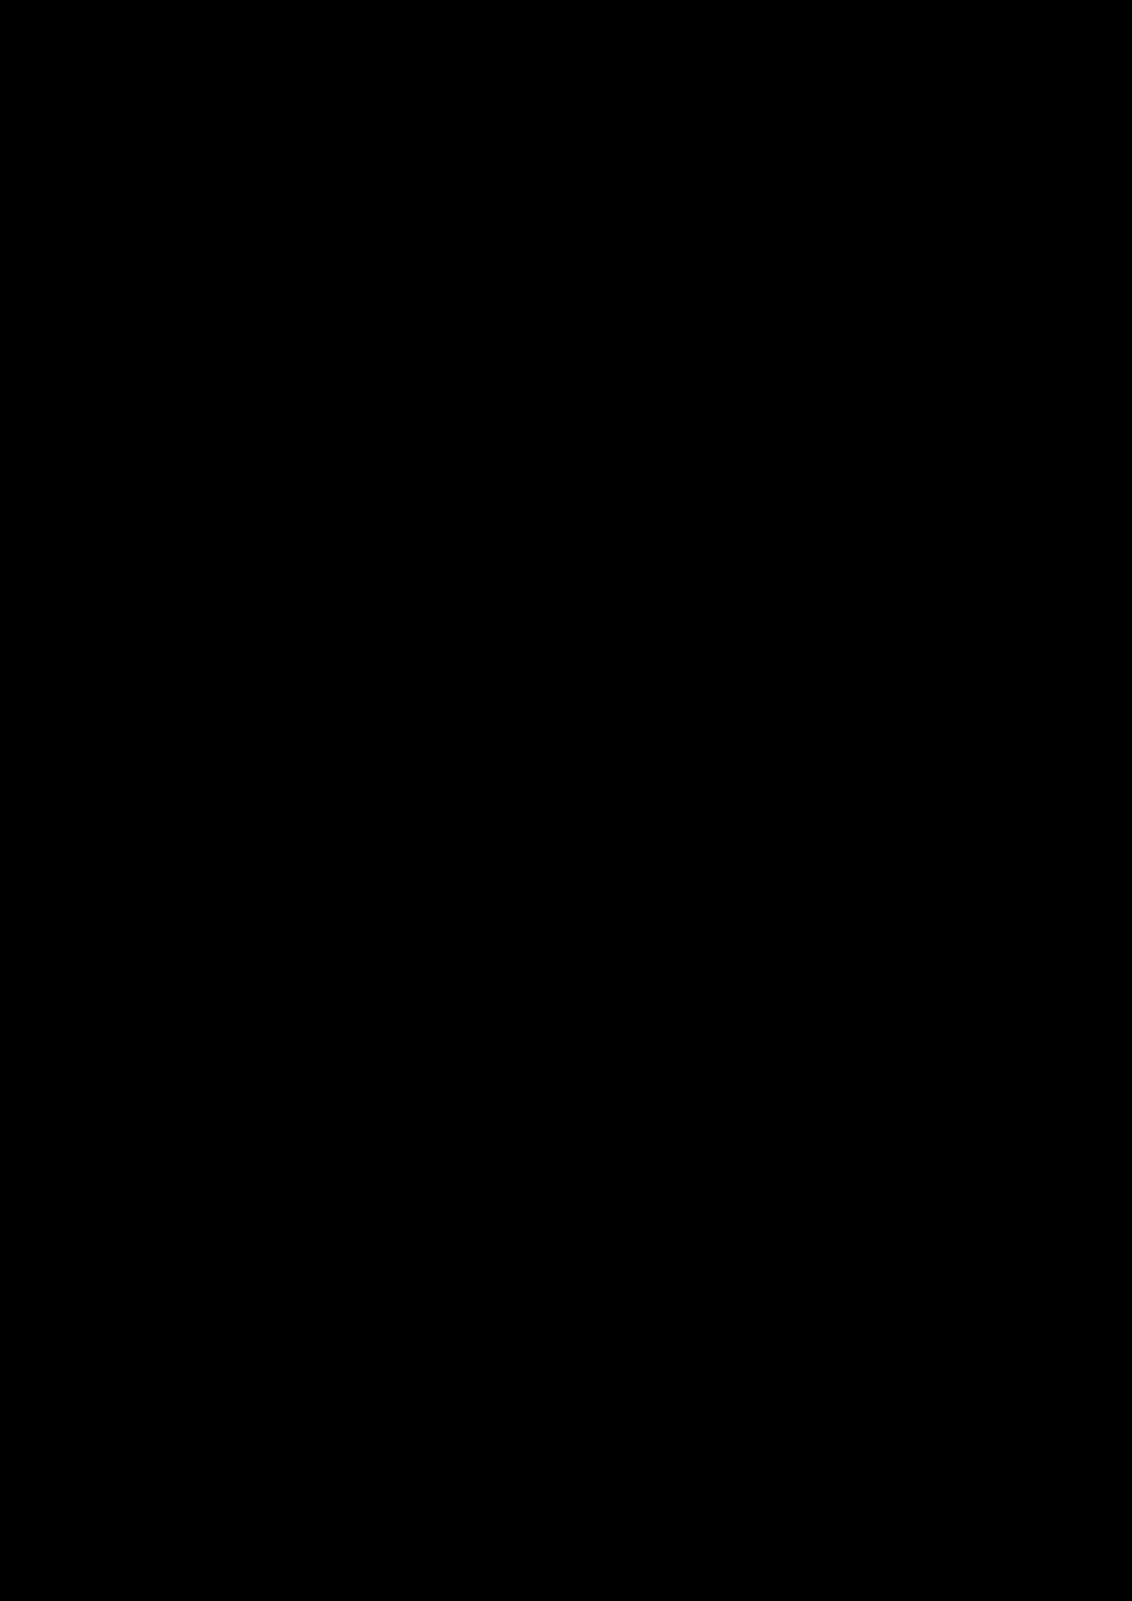 Korolevstvo slez slide, Image 89